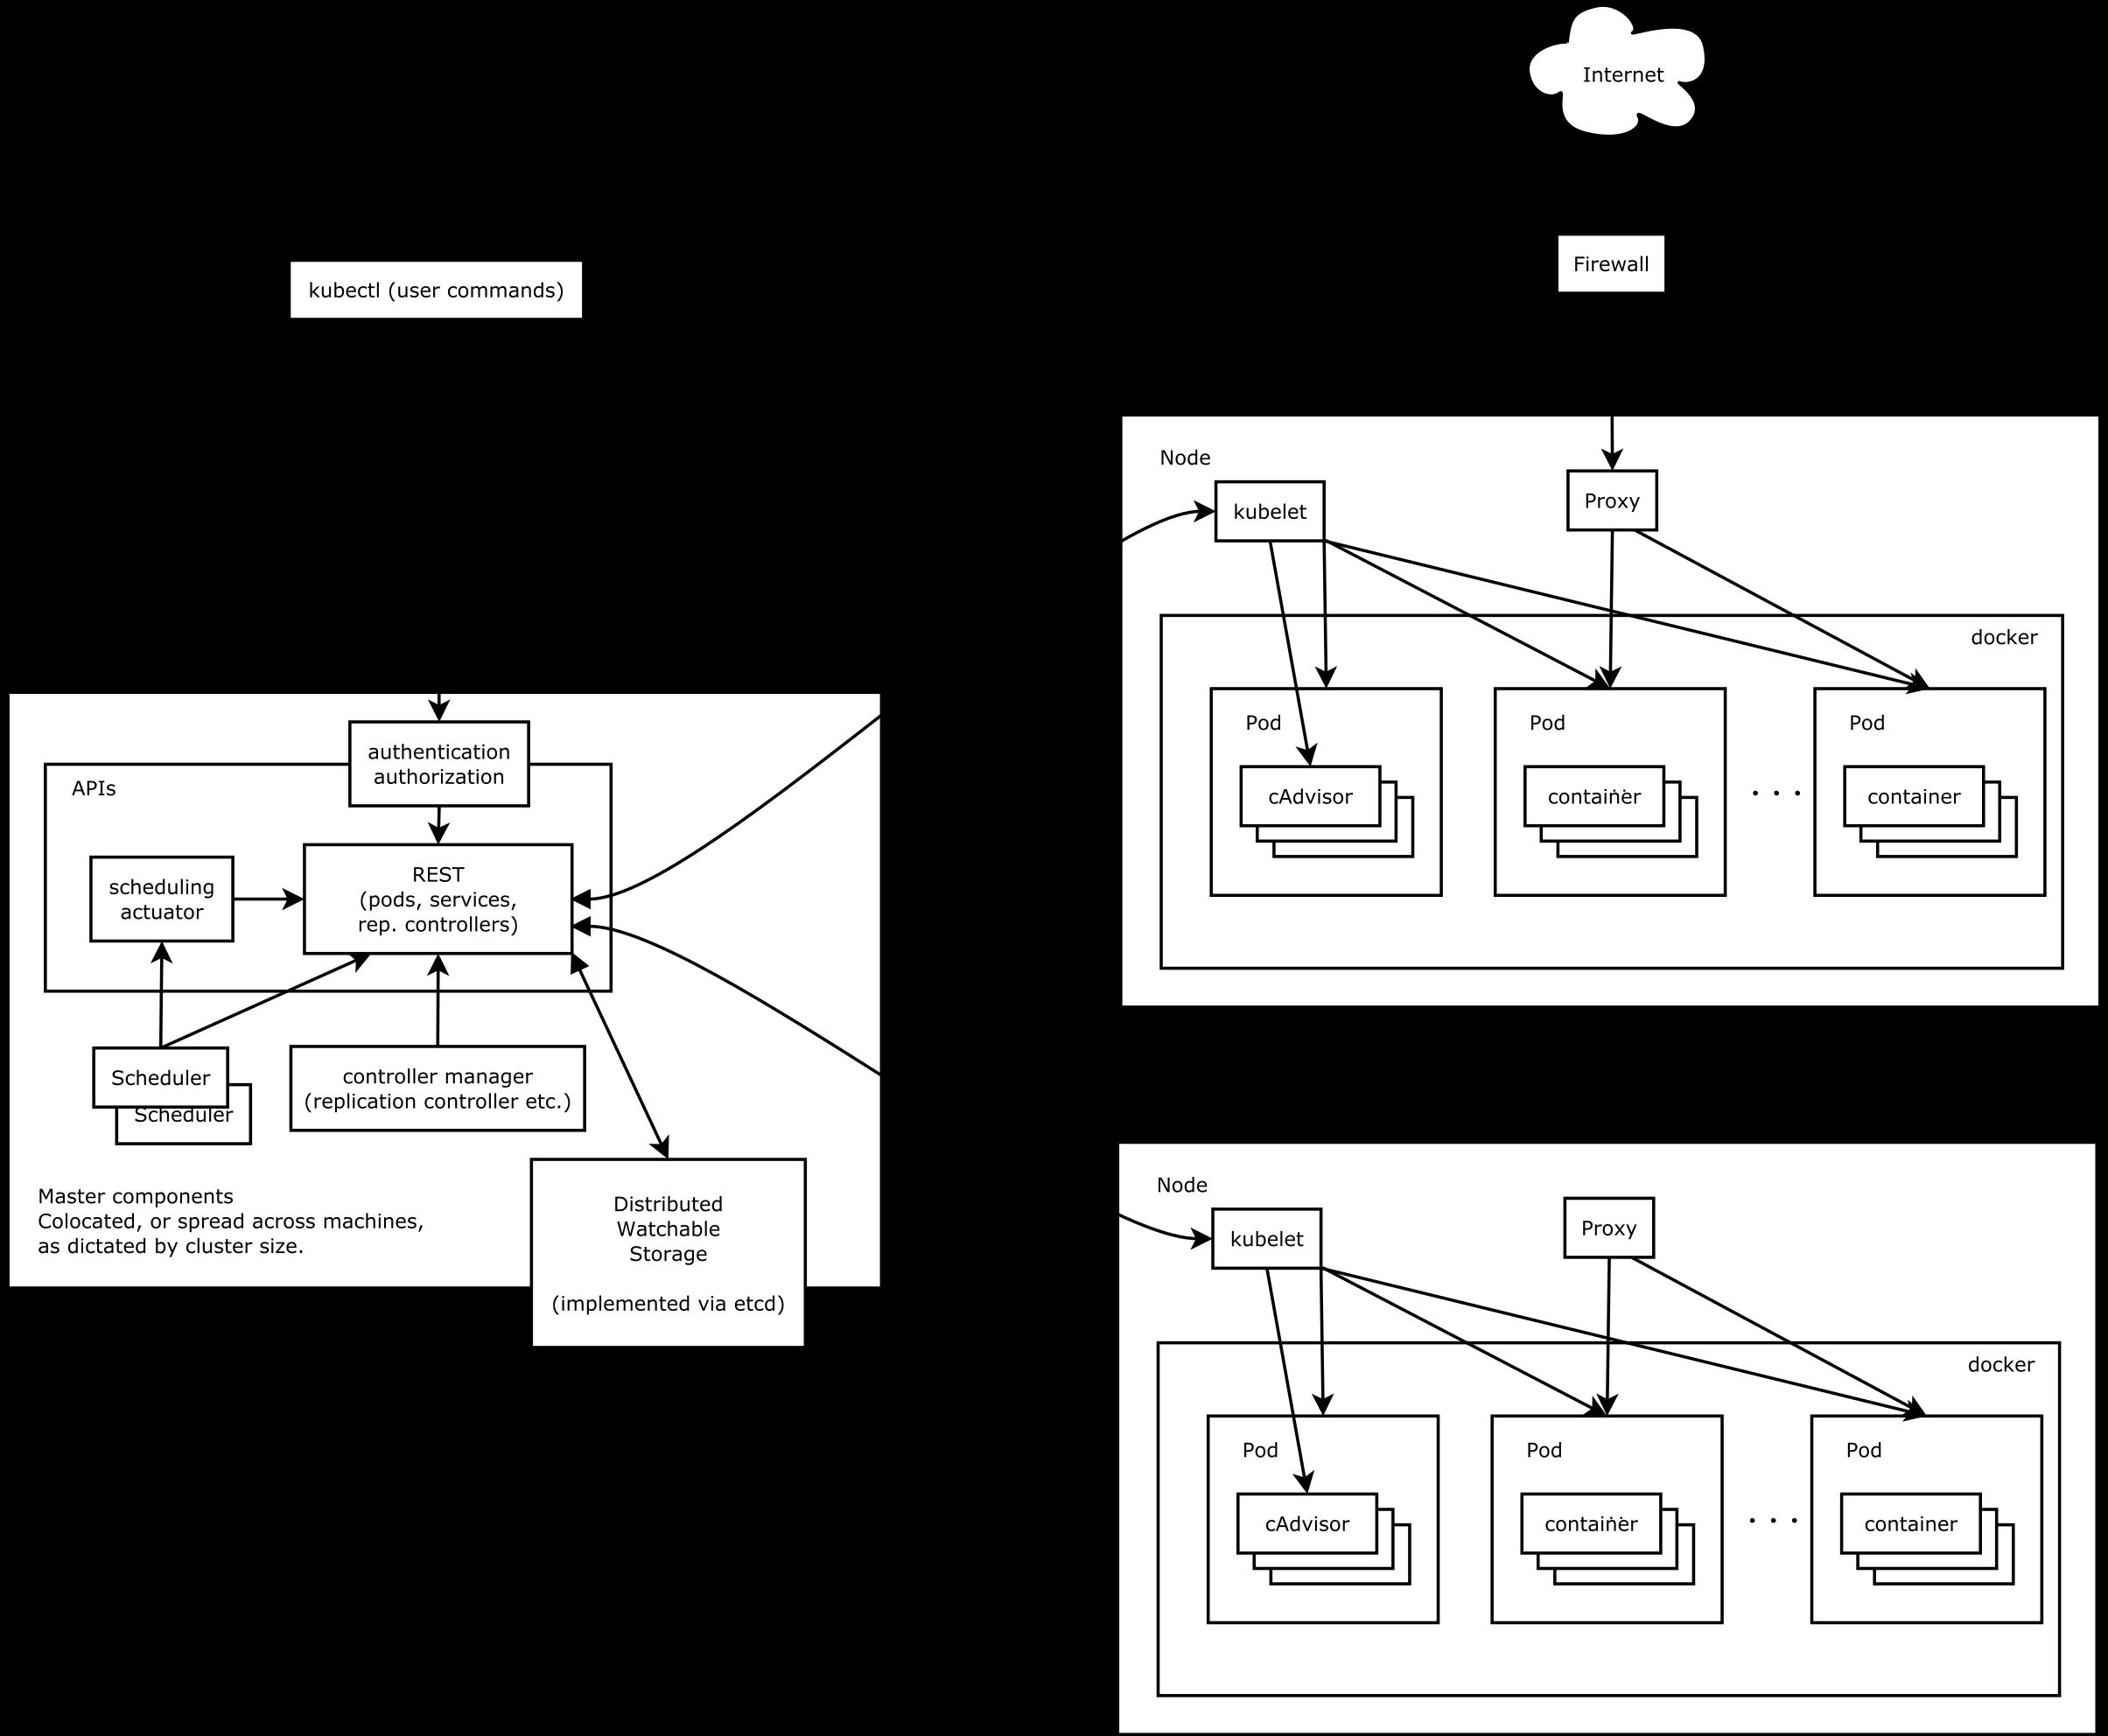 Kubernetesのエコシステムをまとめる - Qiita